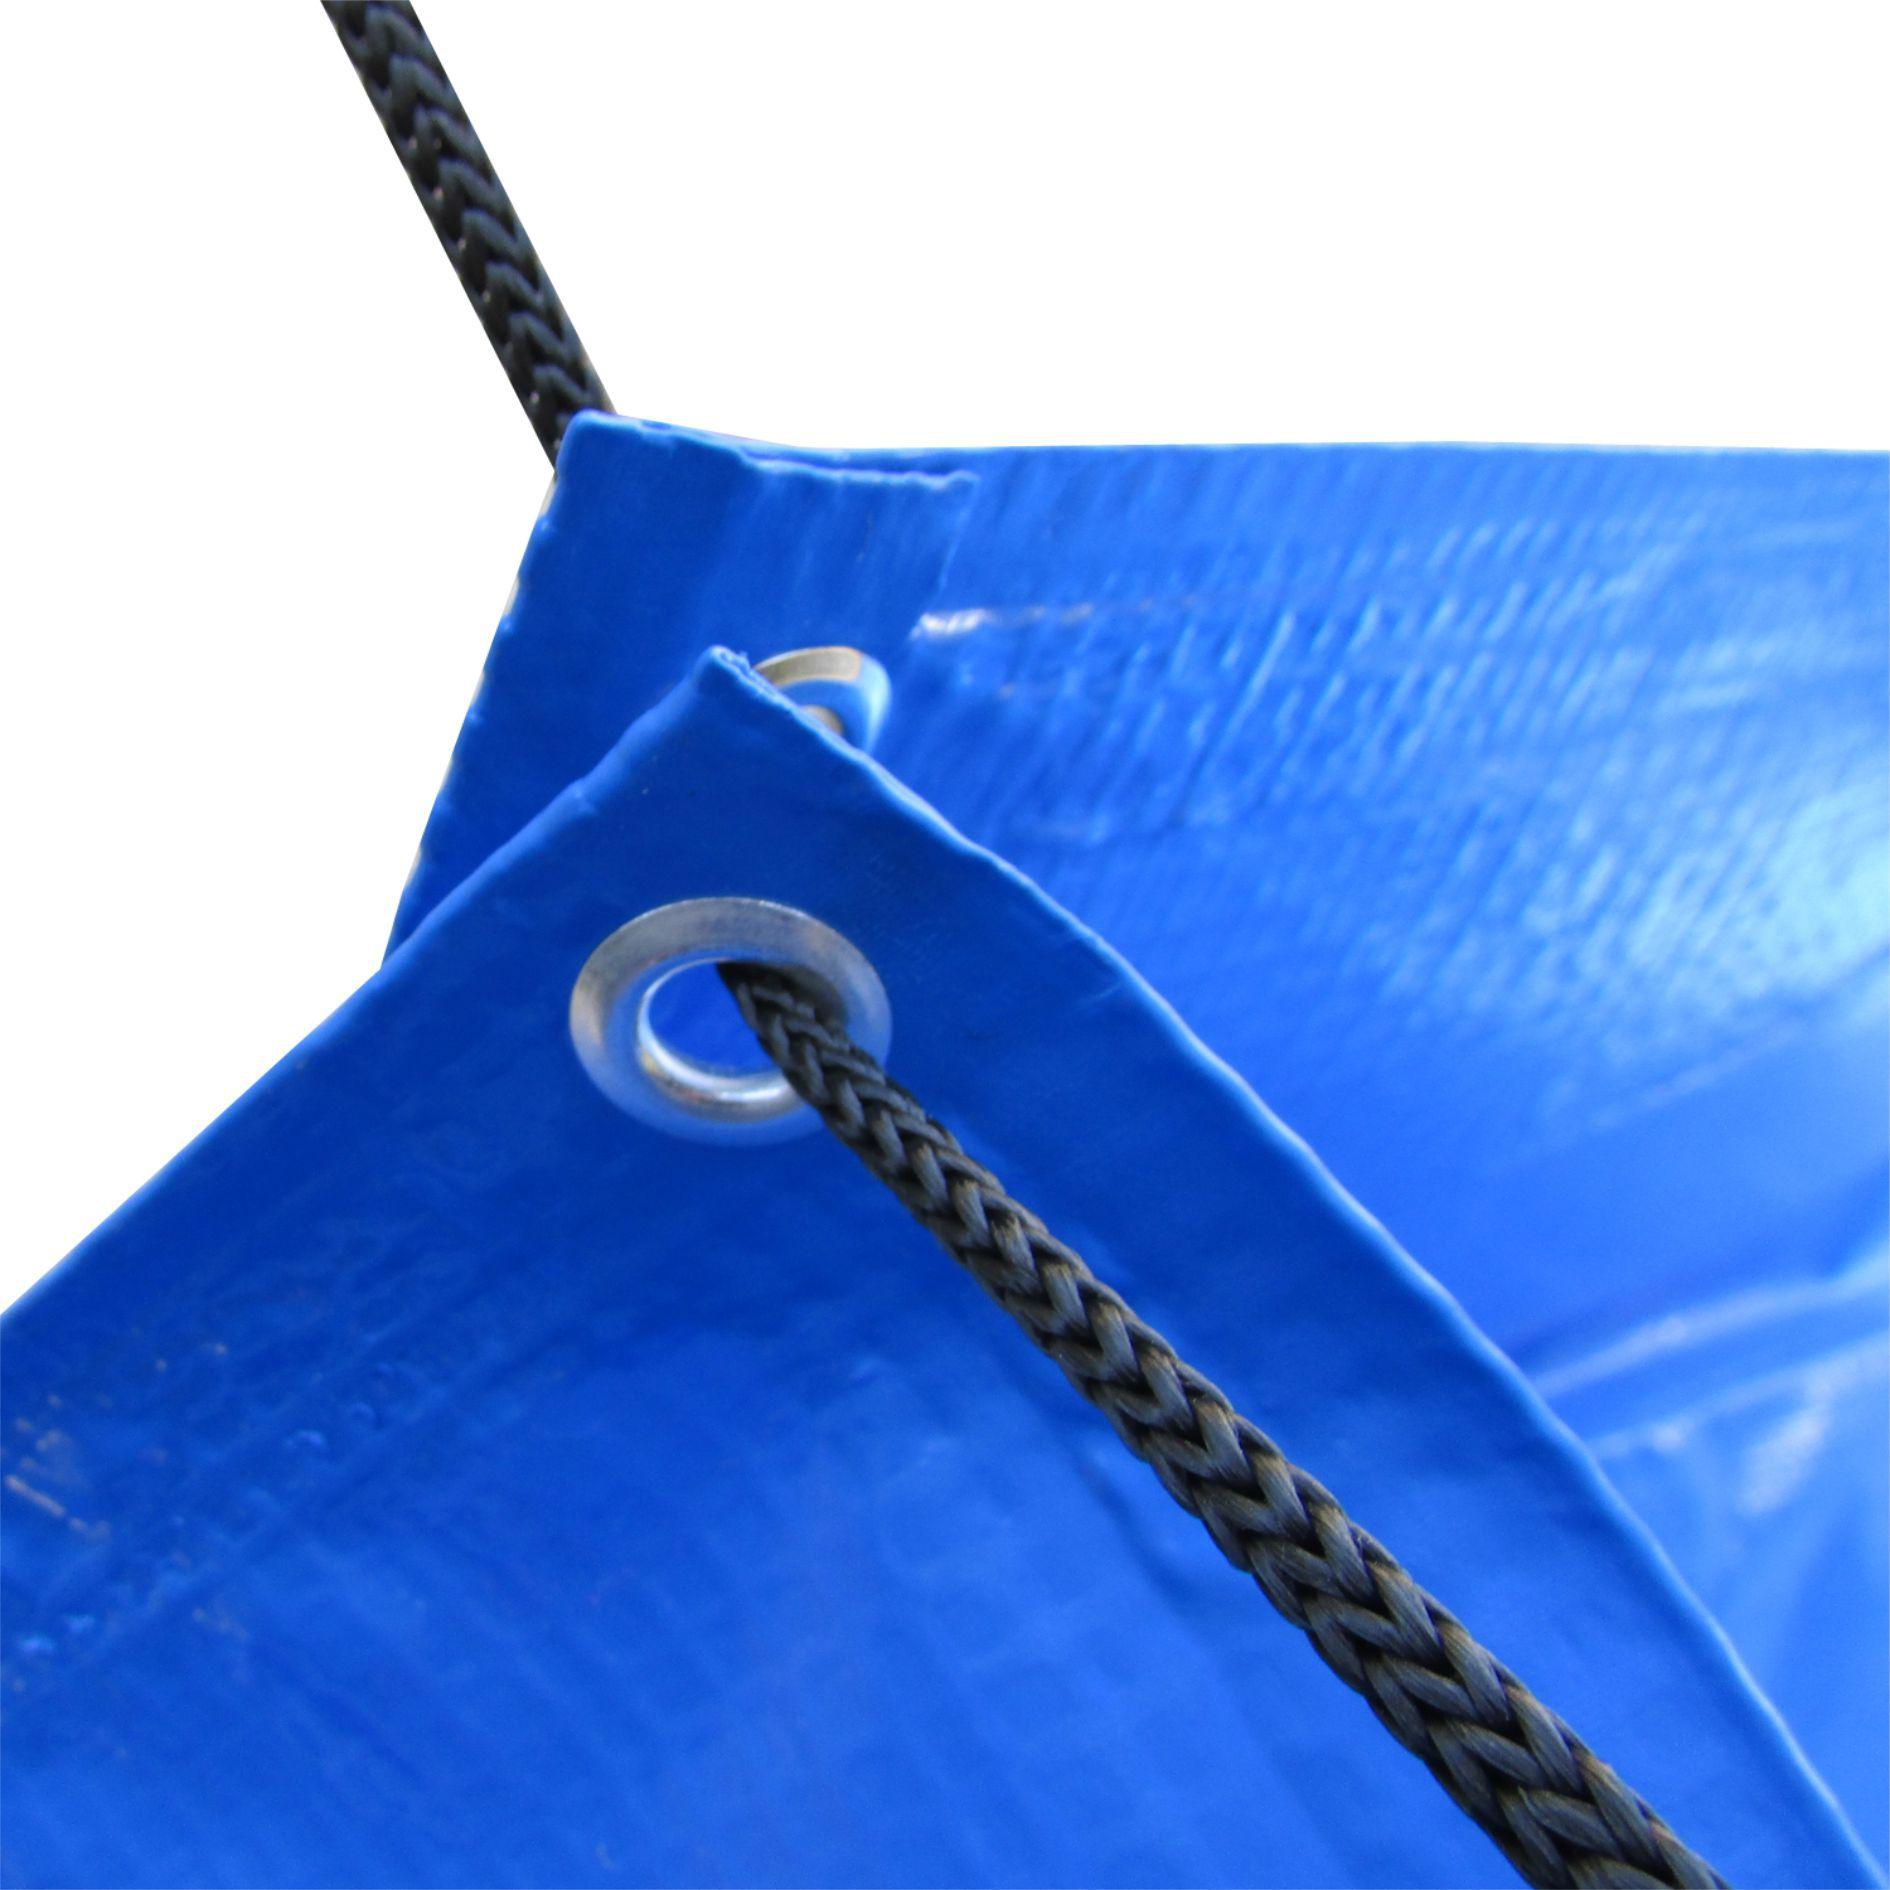 Bolsa Coletora Para Limpeza Ar Condicionado Piso Teto até 60.000 Btus